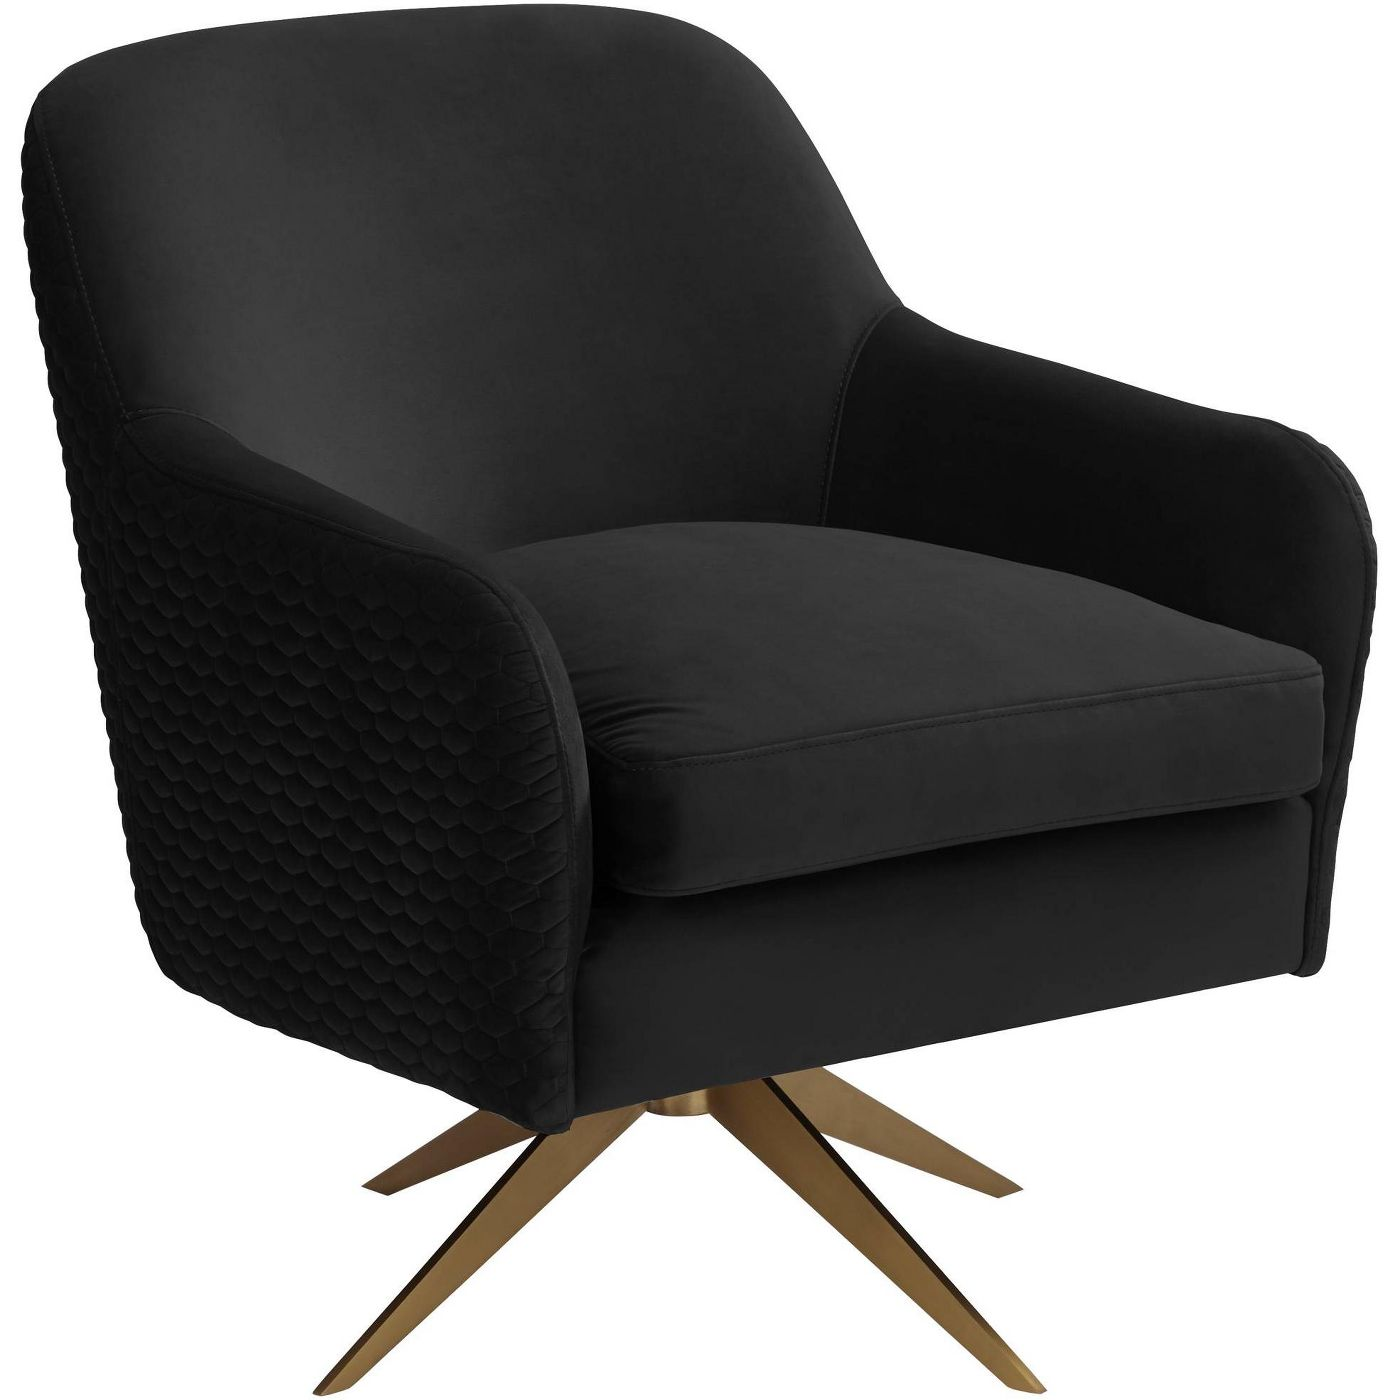 Studio 55D Ames Quilted Onyx Velvet Swivel Chair